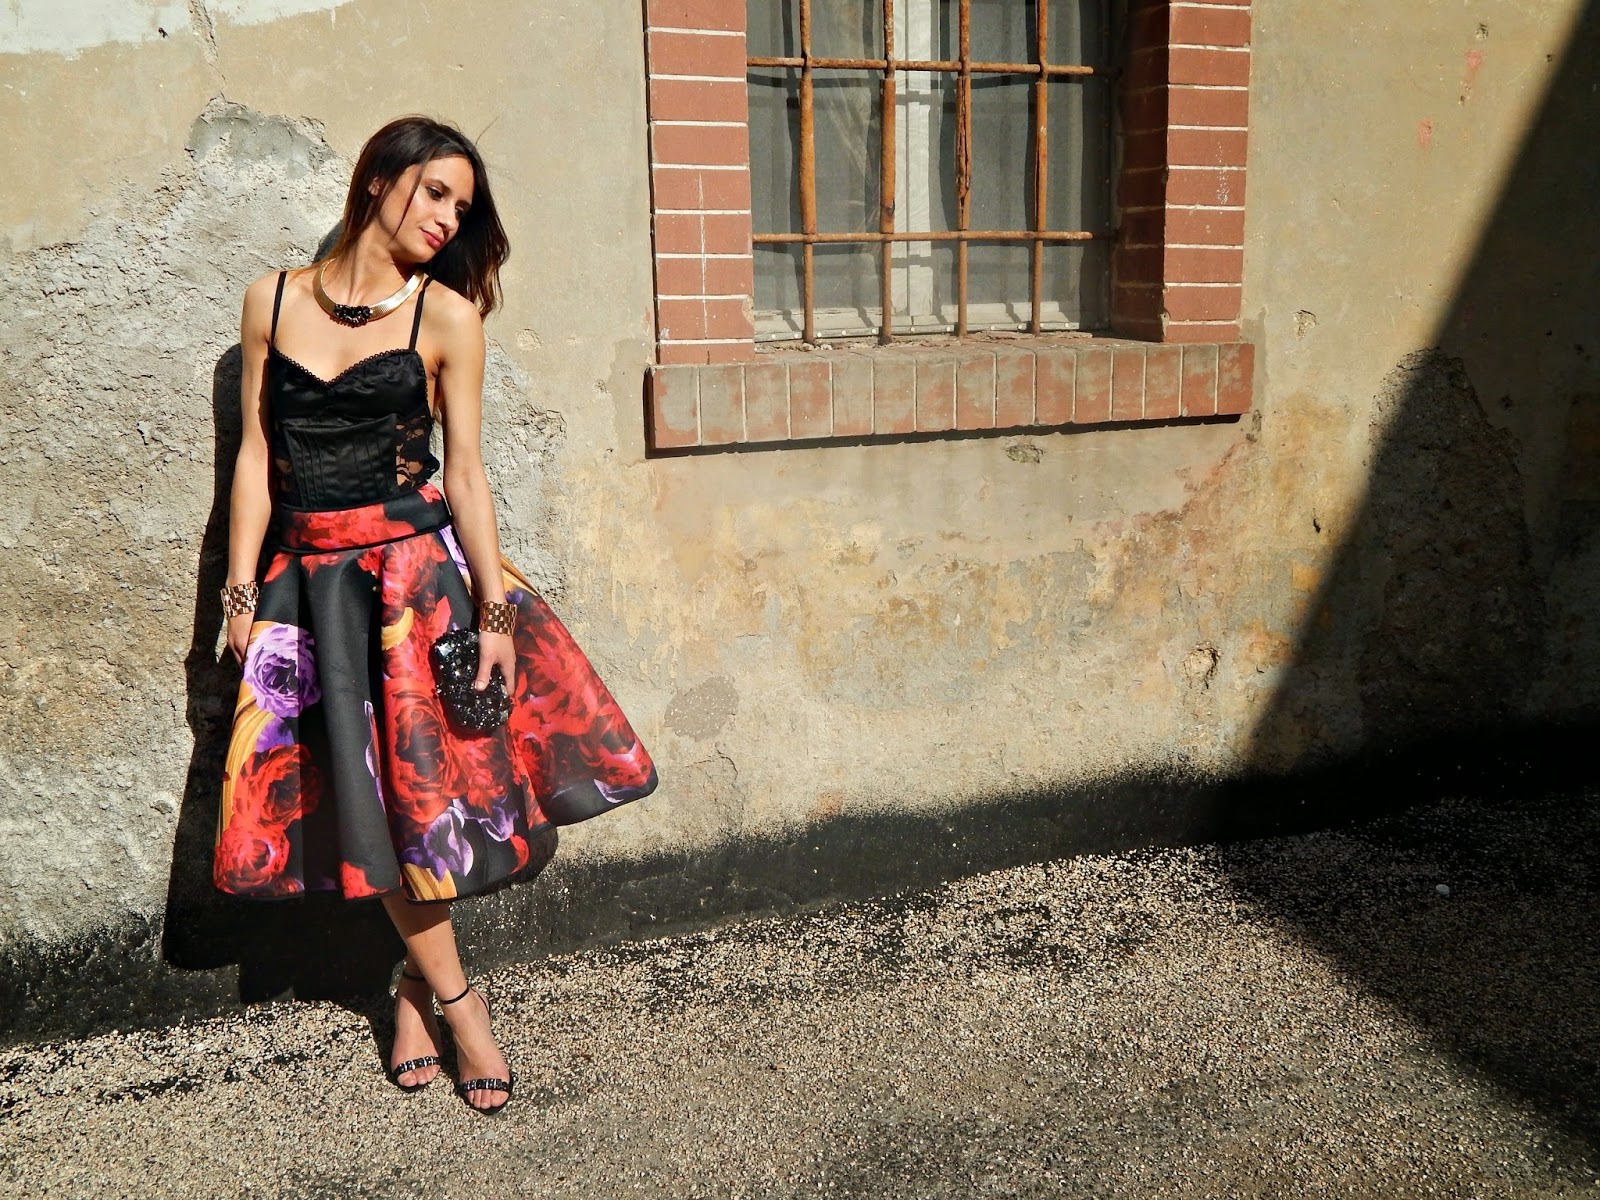 http://www.glamourmarmalade.com/